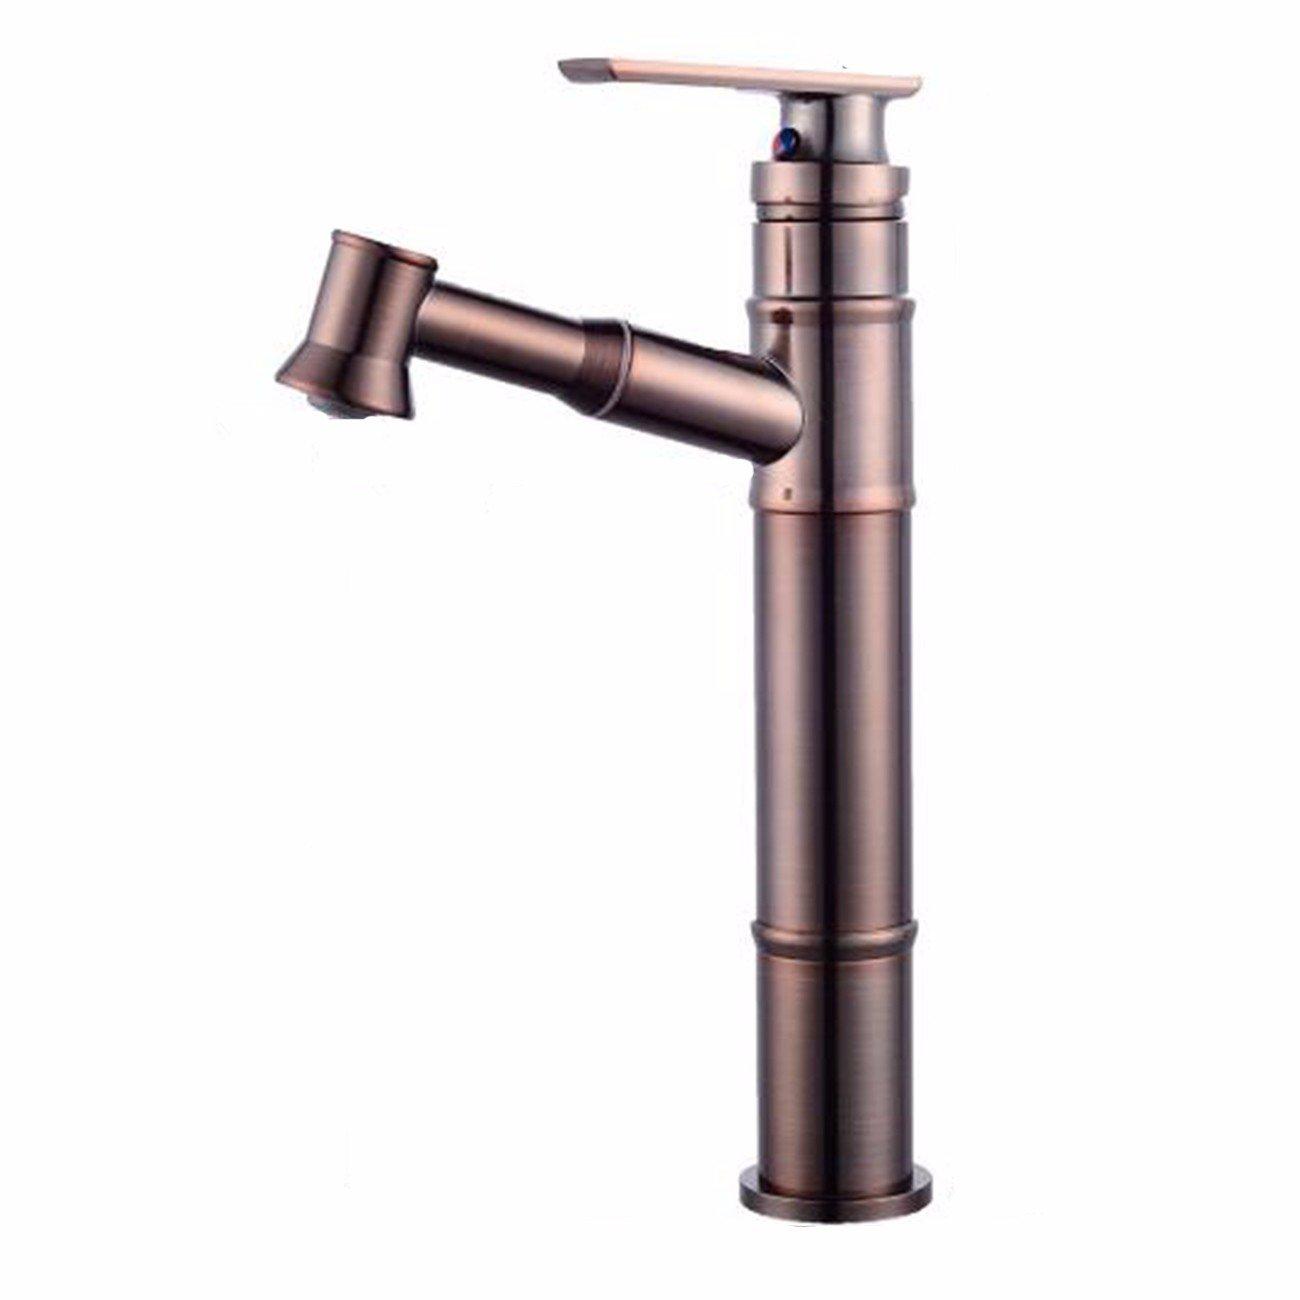 Basin Sink Mixer Tap Basin Water Faucet Water Bath Faucet Bathroom Washbasin Faucet Faucet Hot and Cold Faucet by WAWZJ-Basin Sink Mixer Tap